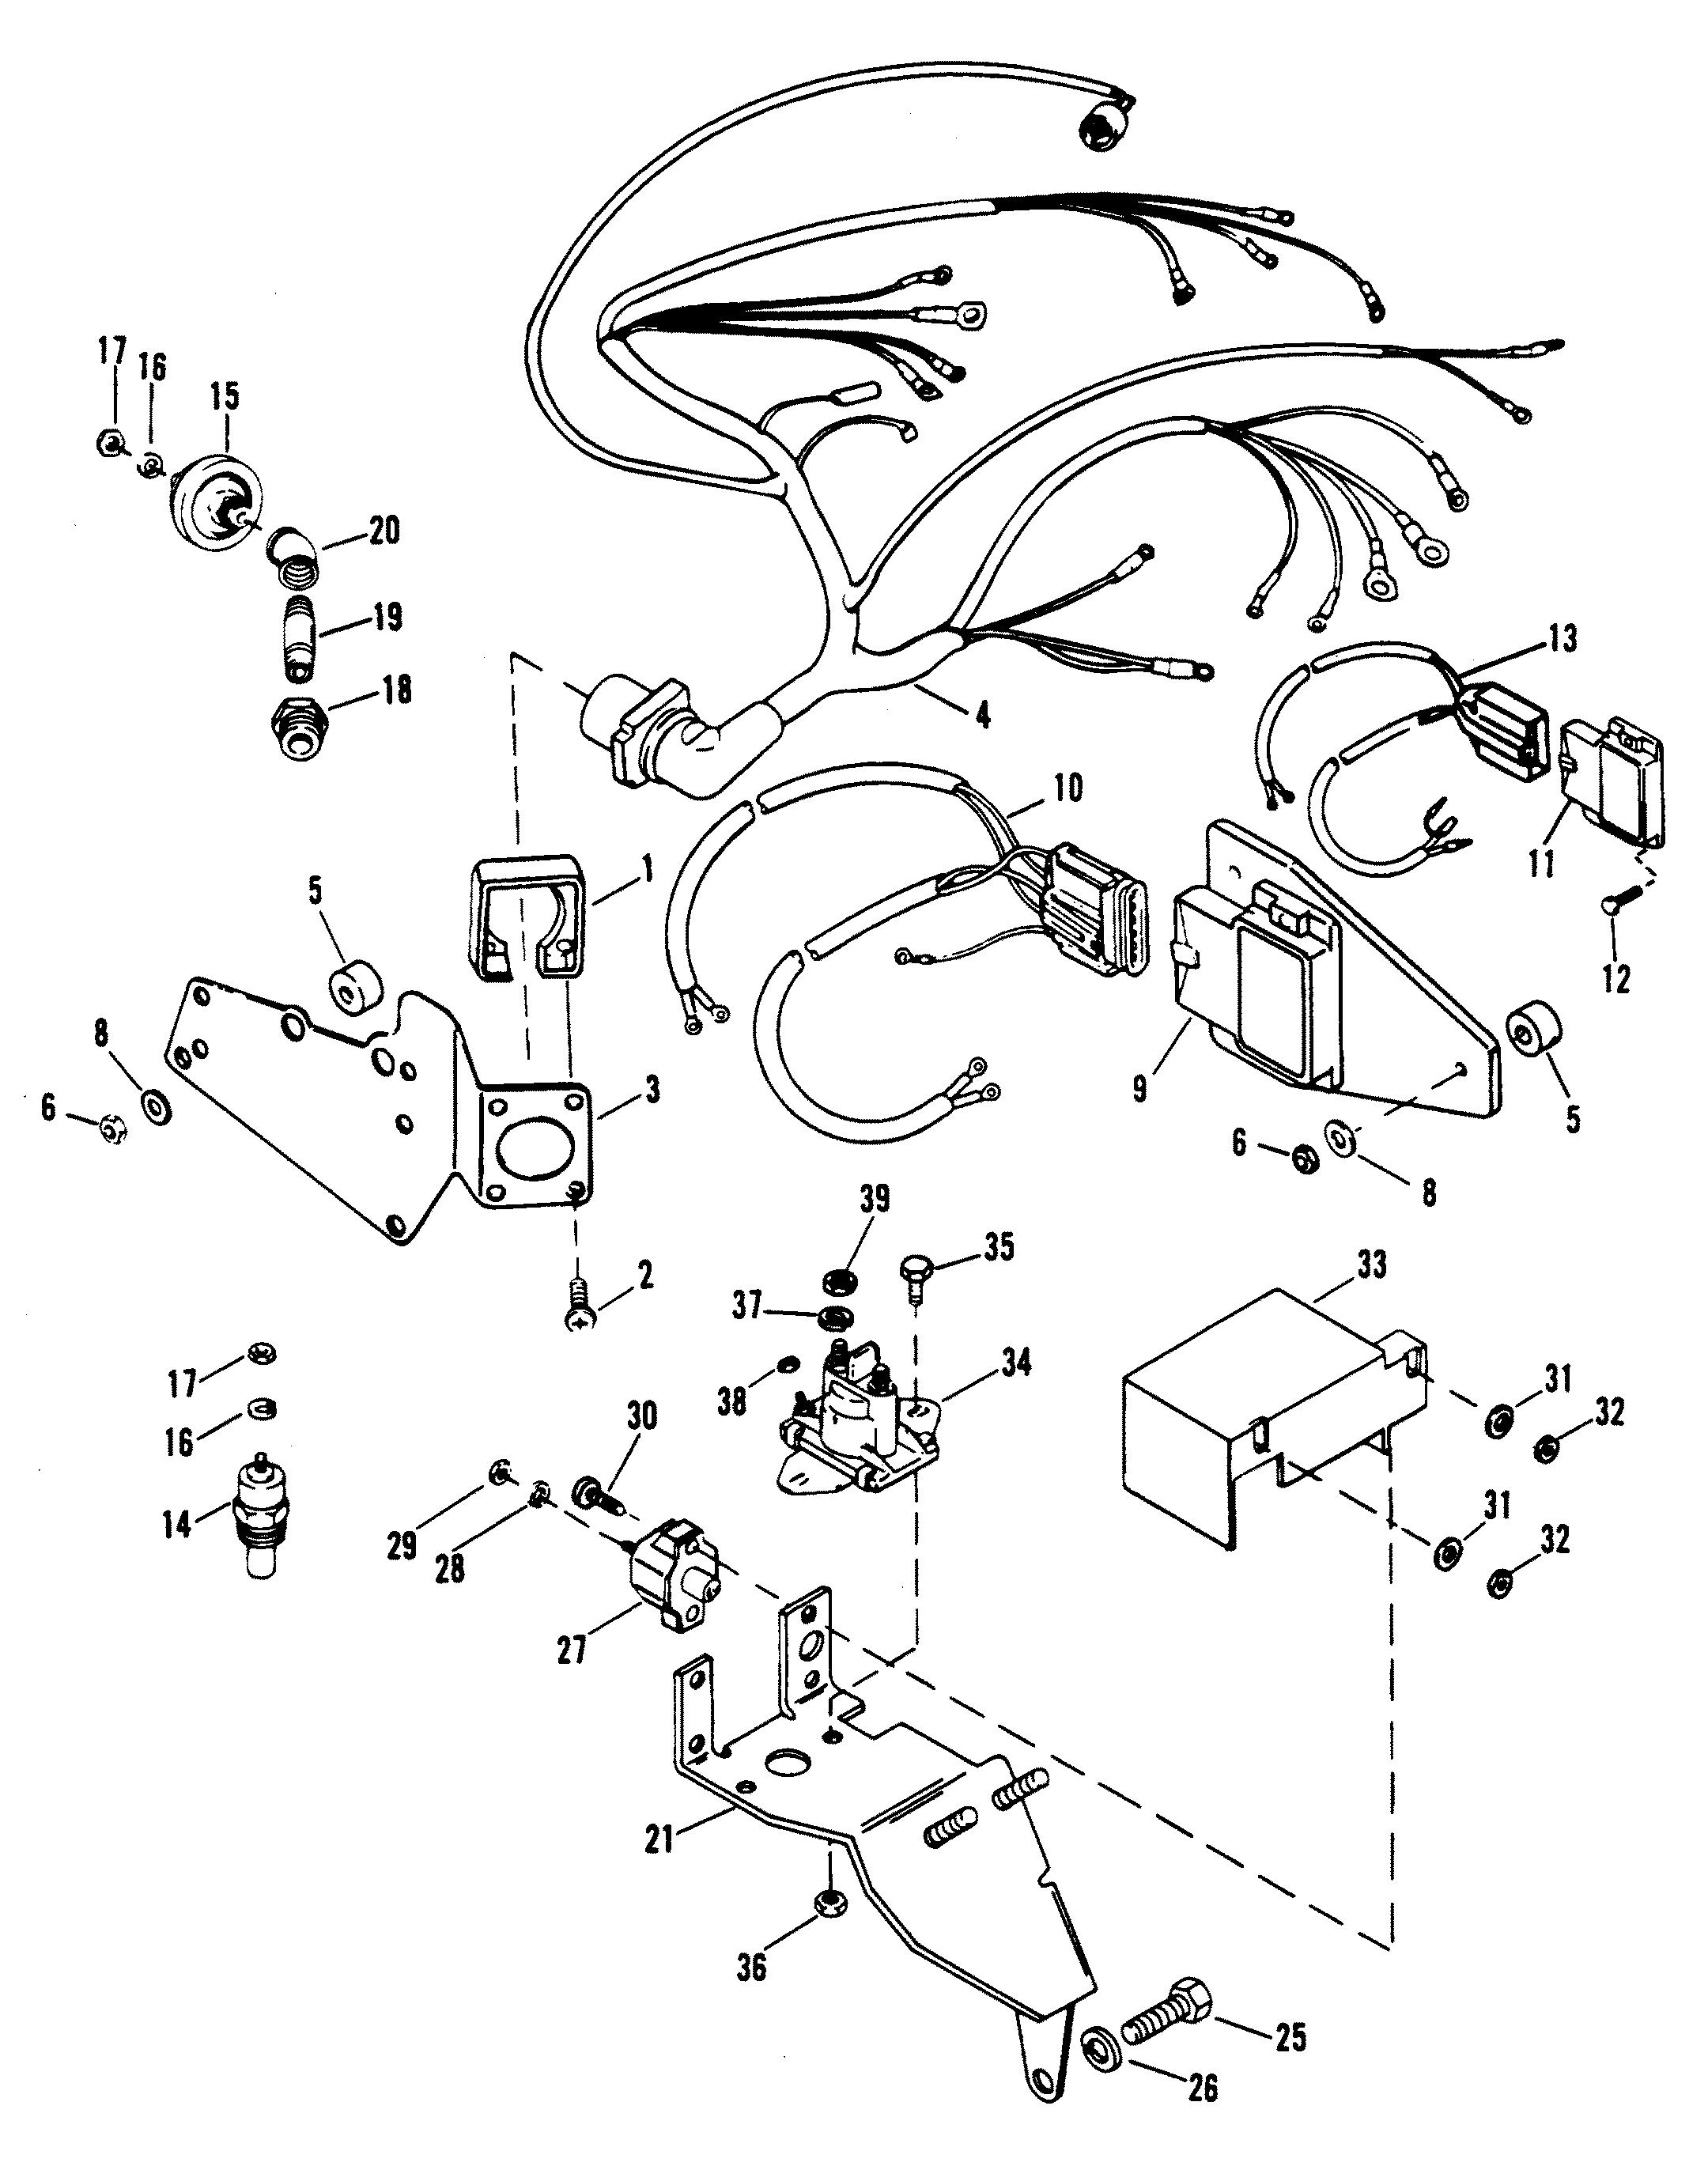 Mercury | MERCRUISER | 7.4L MIE (LH) GEN. V GM 454 V-8 1992 ... on 454 plug wire diagram, 454 engine diagram, 454 distributor diagram, chevy 454 diagram, 454 alternator diagram, 454 assembly diagram, 454 ignition diagram, 454 big block diagram, 454 exhaust diagram, marine 454 diagram,